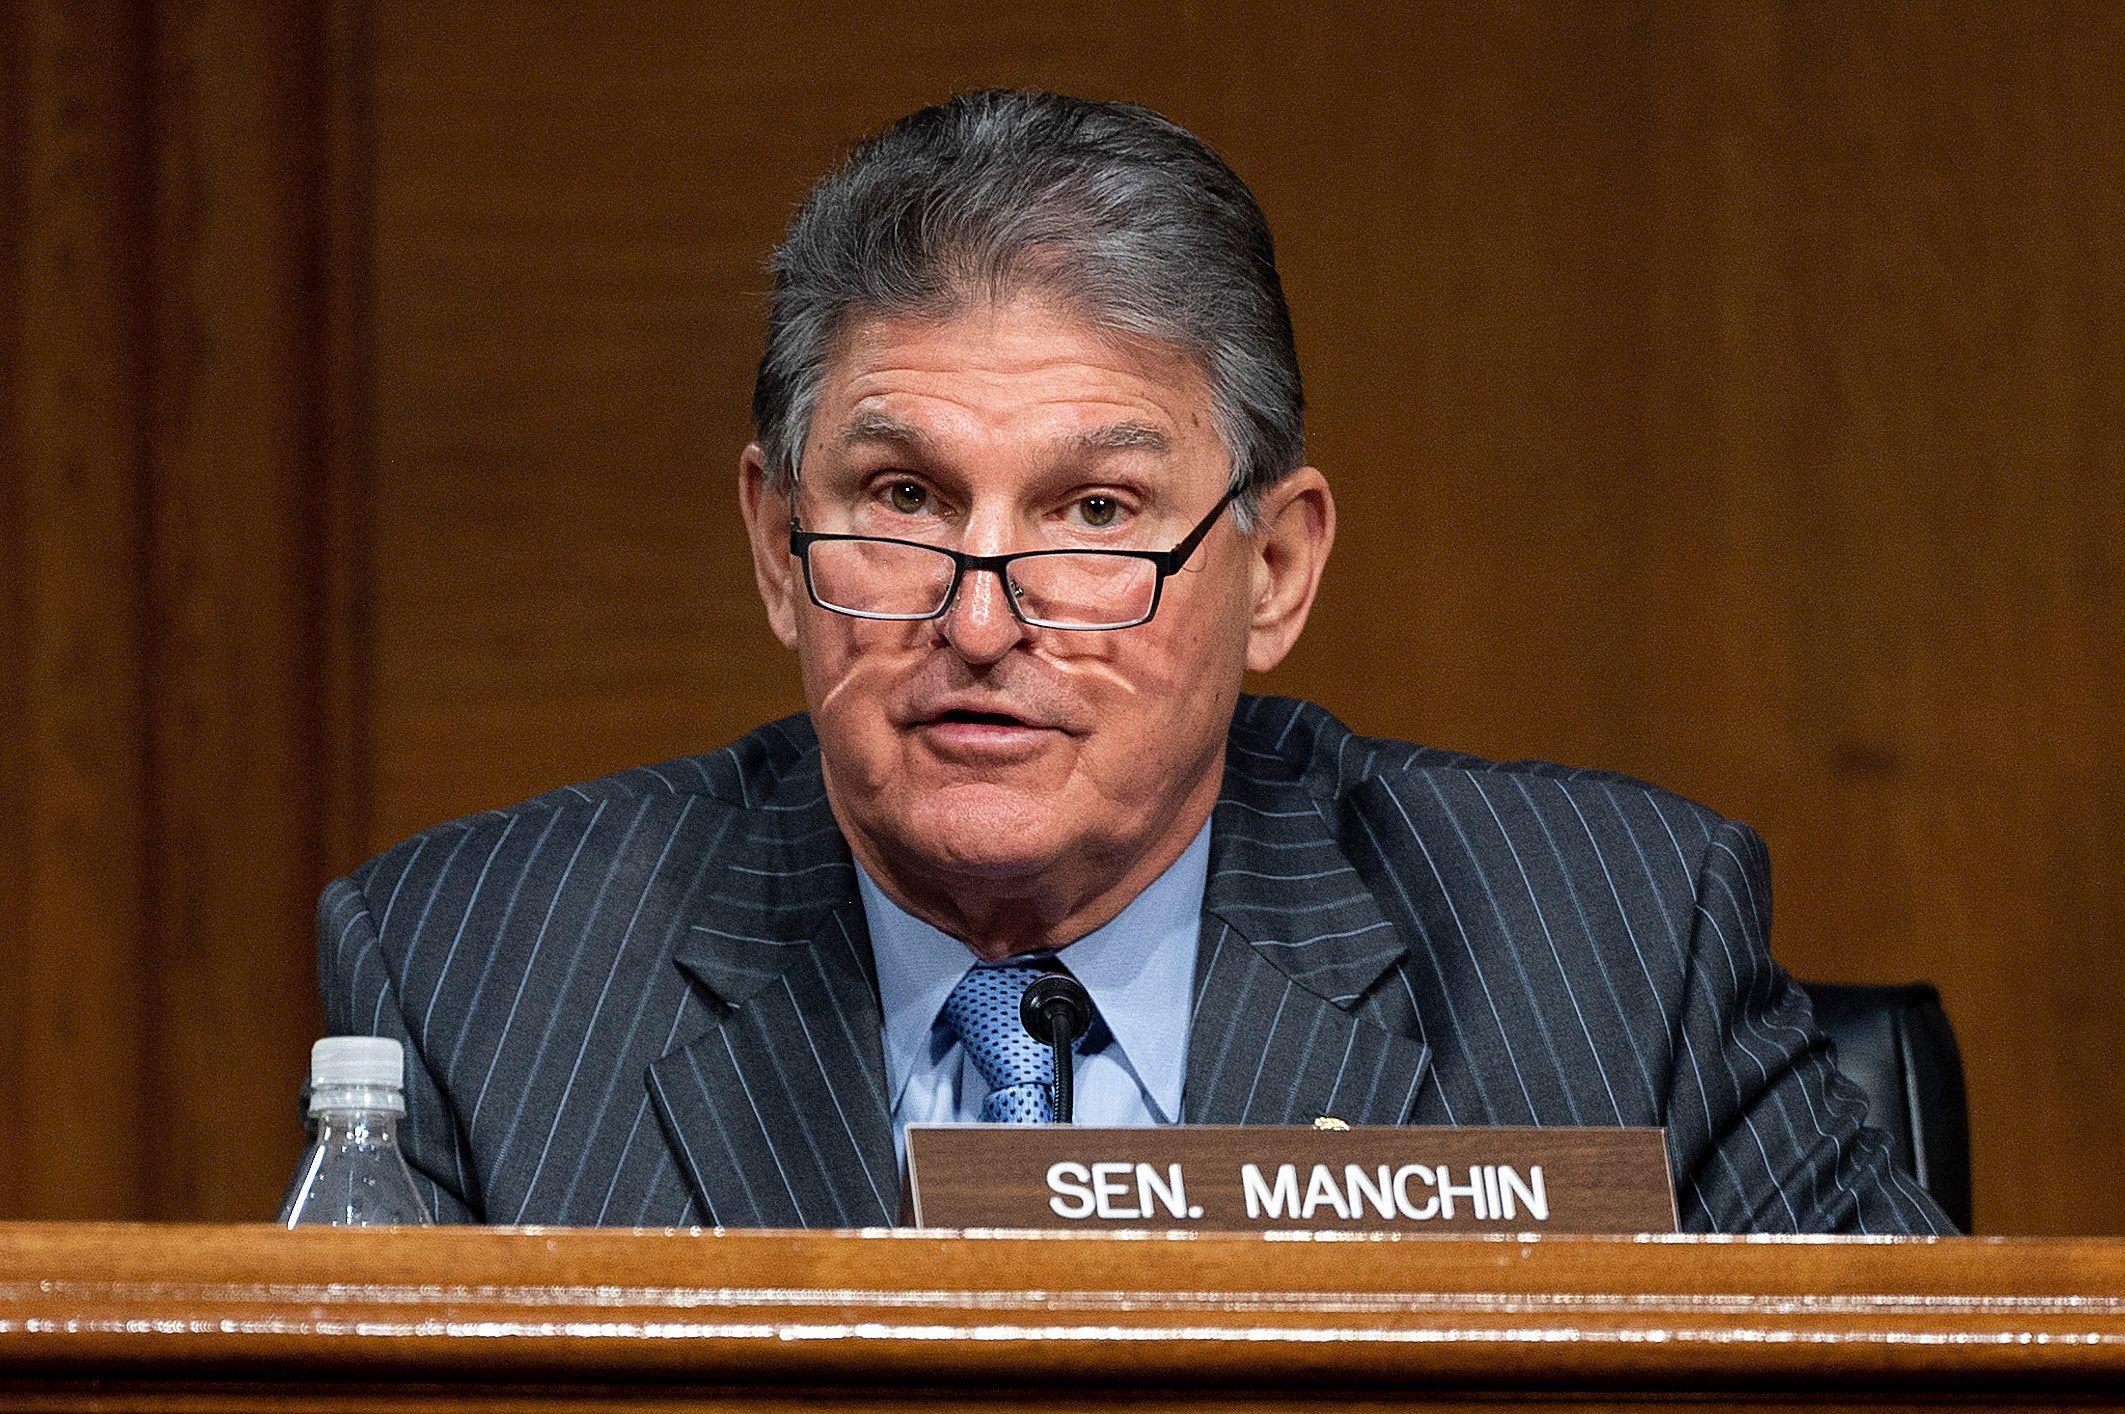 Sen. Joe Manchin speaks in the Senate.